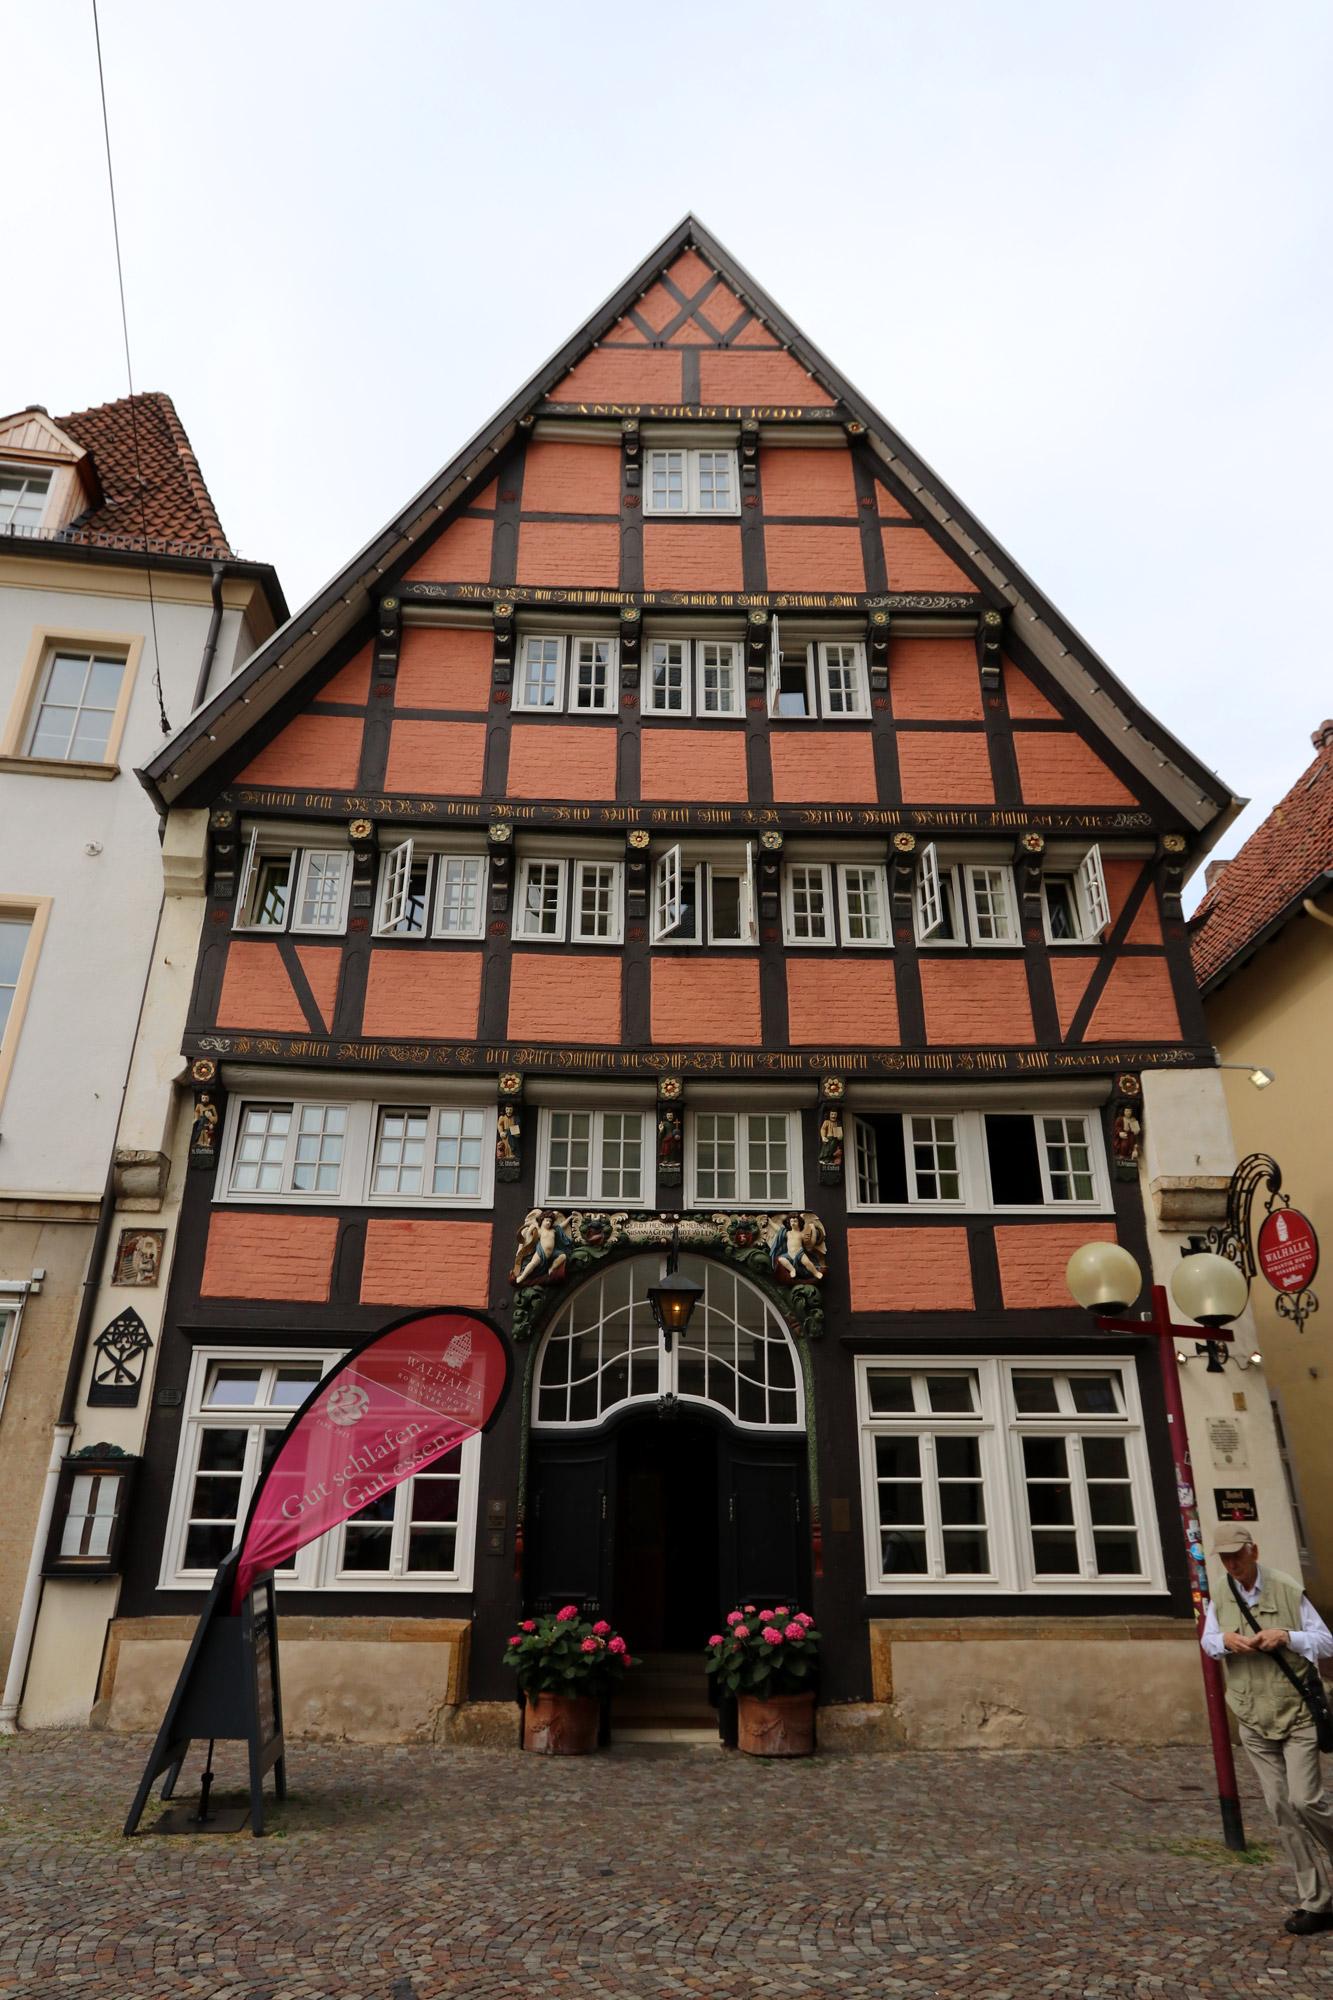 Stedentrip Osnabrück - Stadswandeling door Osnabrück